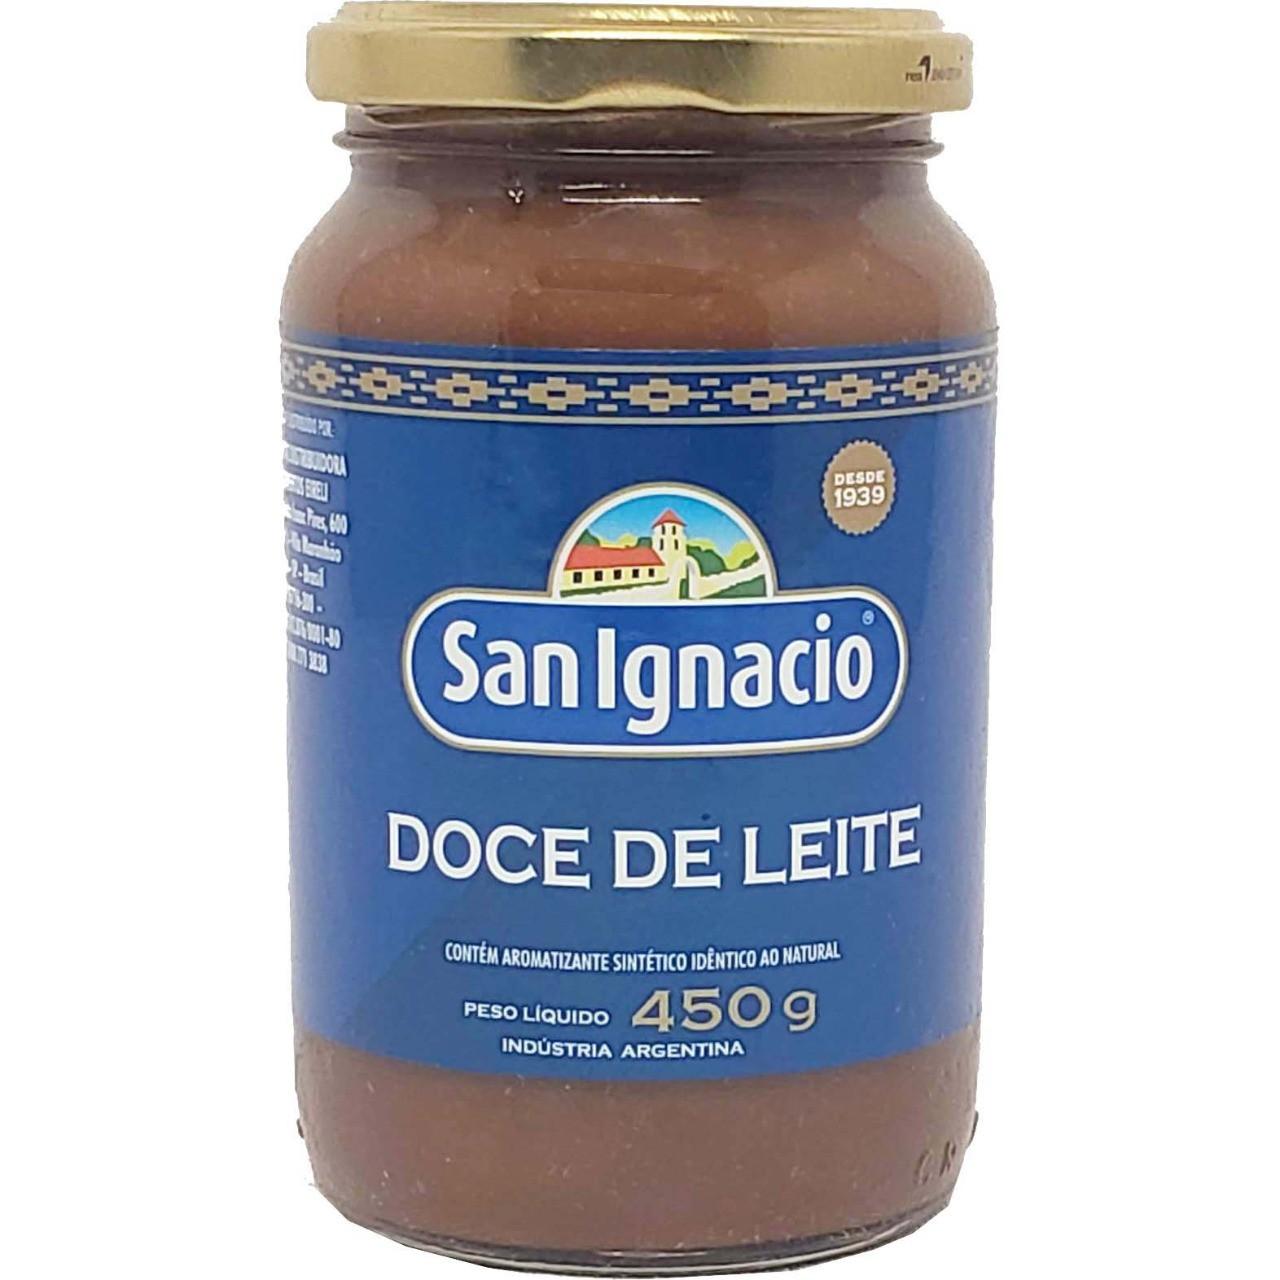 Doce de Leite San Ignacio - 450g -